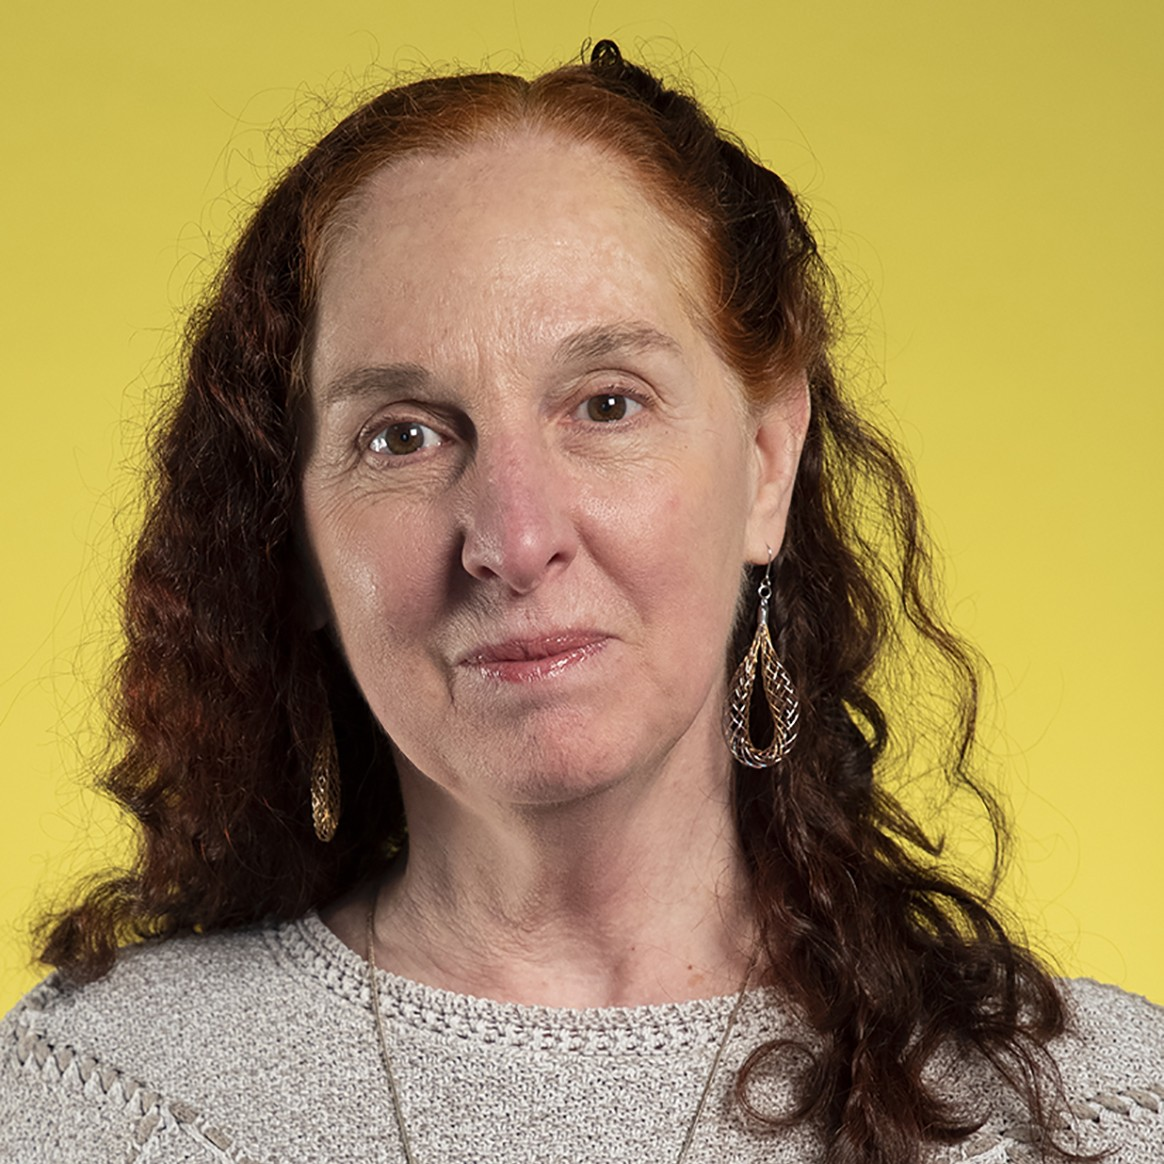 Karen Keifer-Boyd's headshot against yellow background.